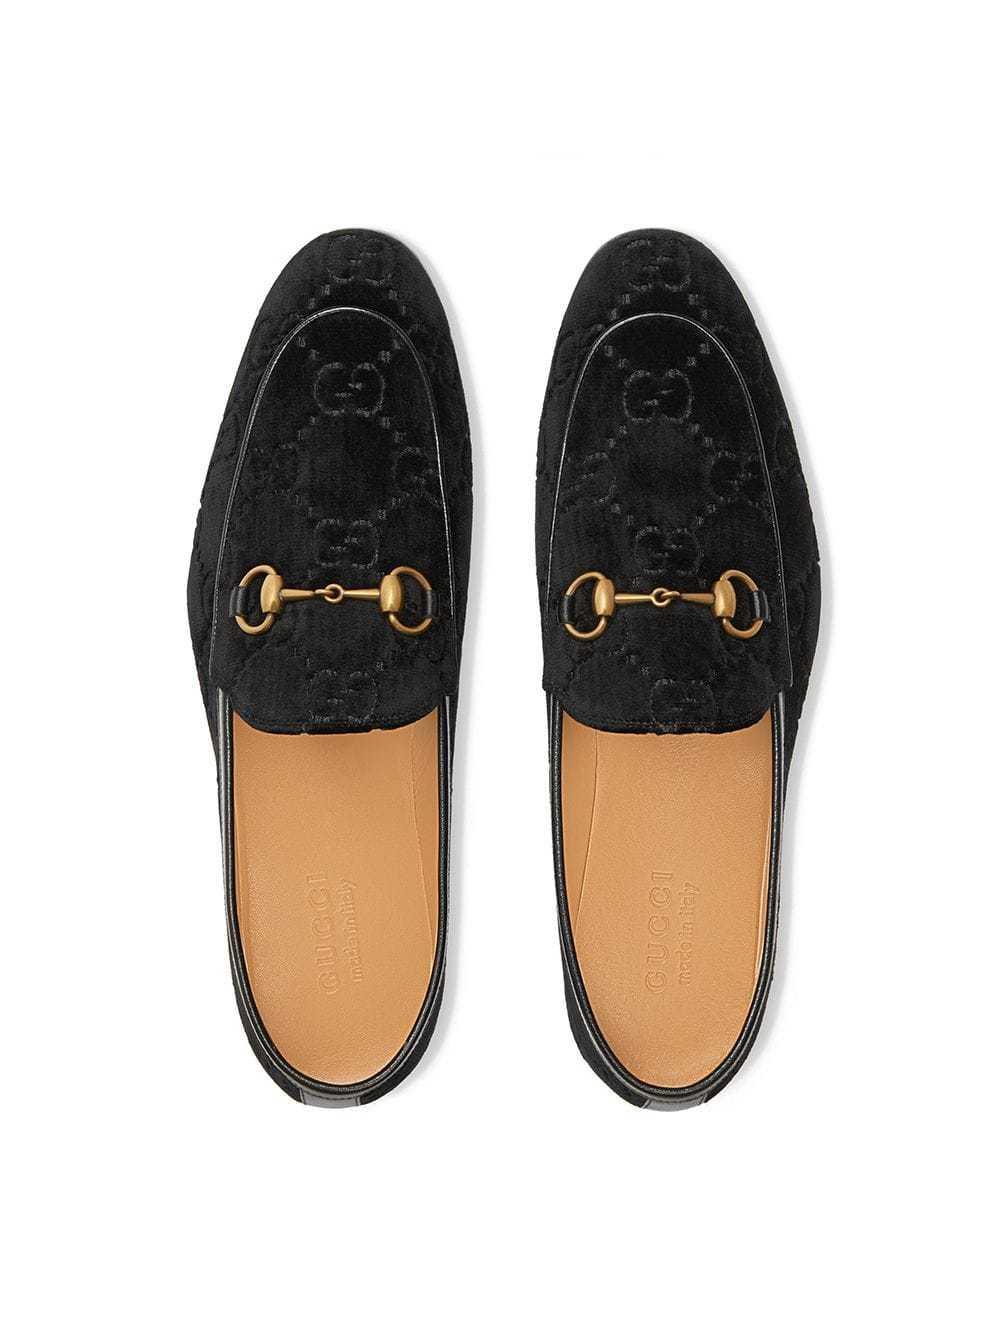 13ce5772549 ... Gucci Jordaan Gg Velvet Loafers ...